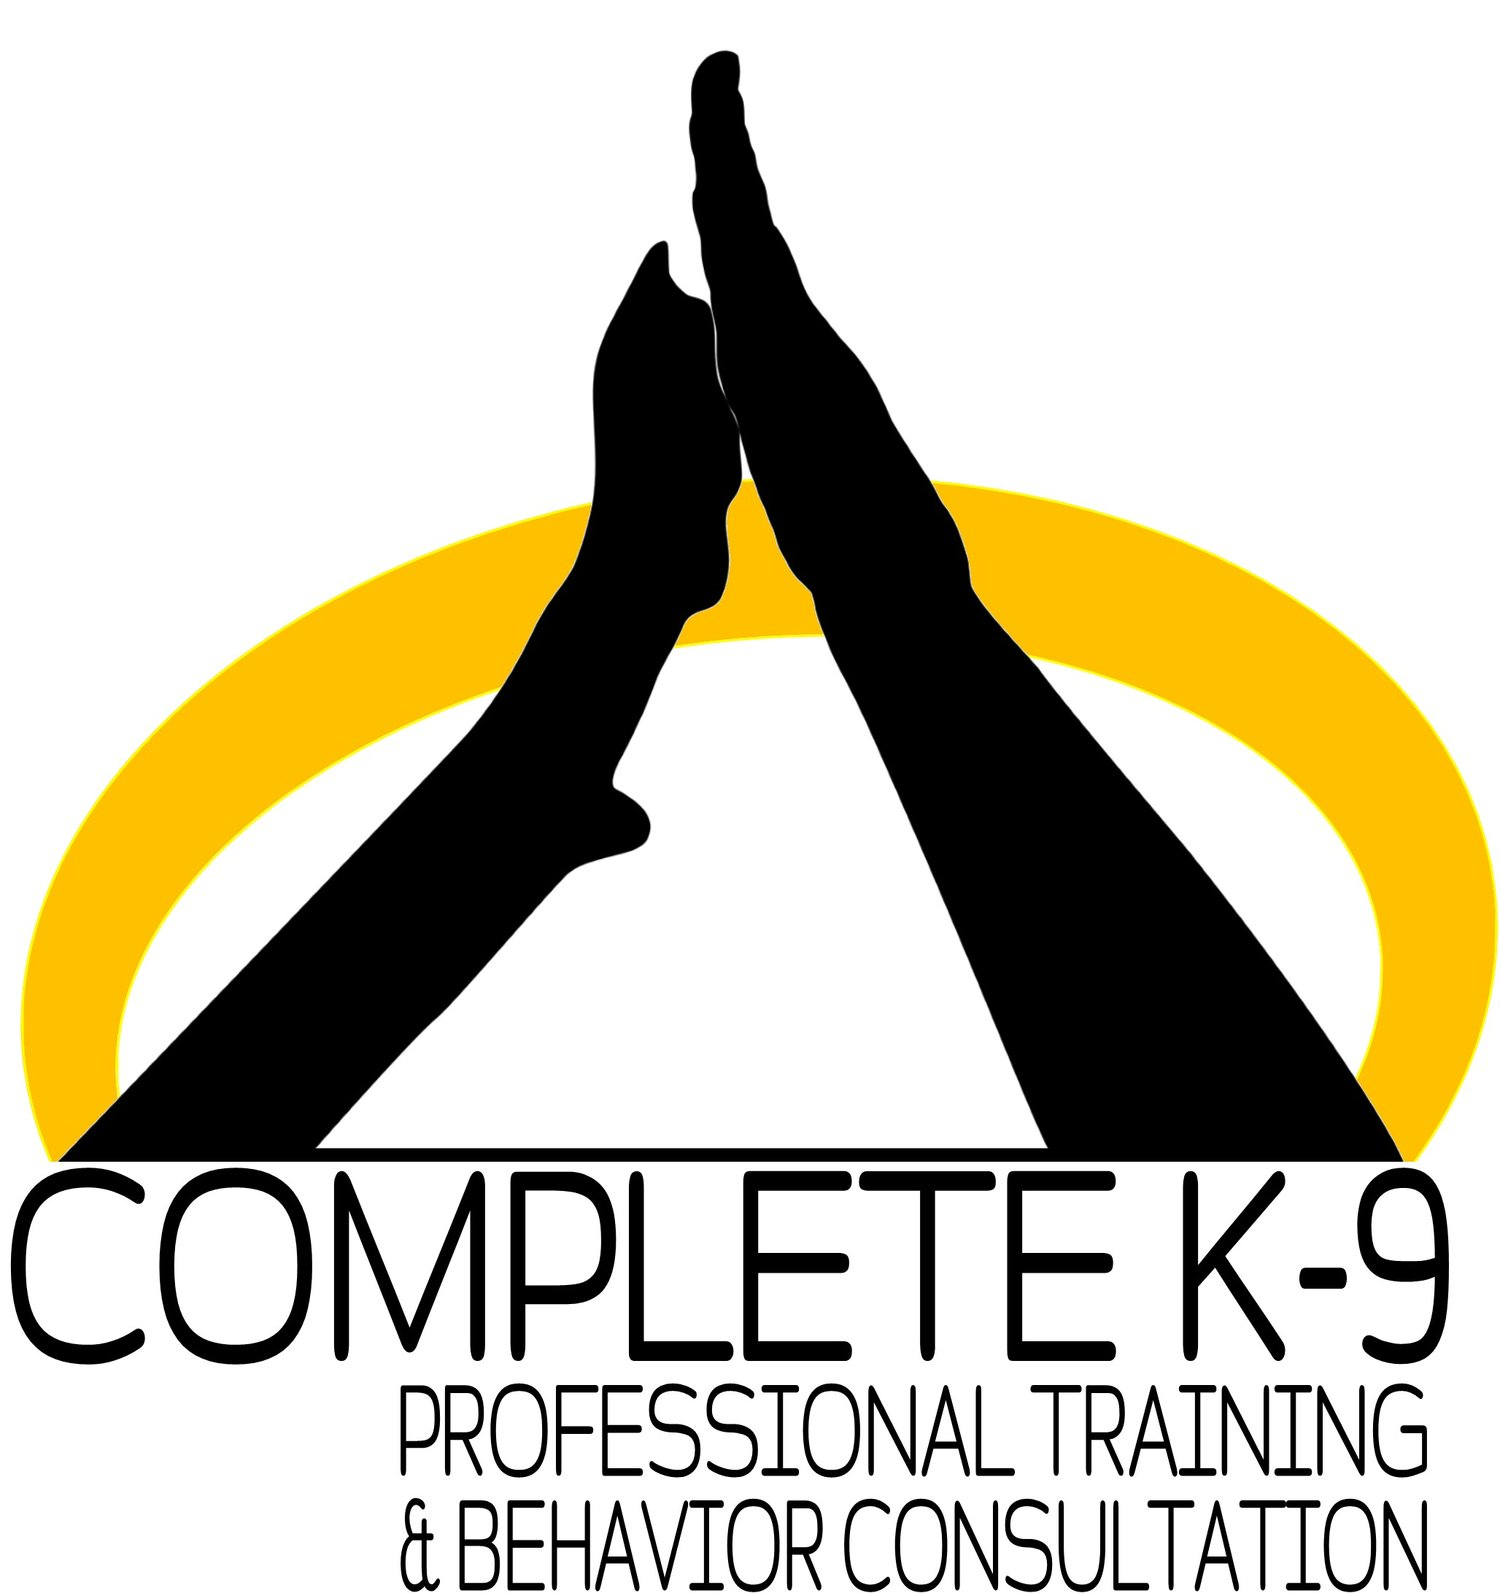 Complete K-9